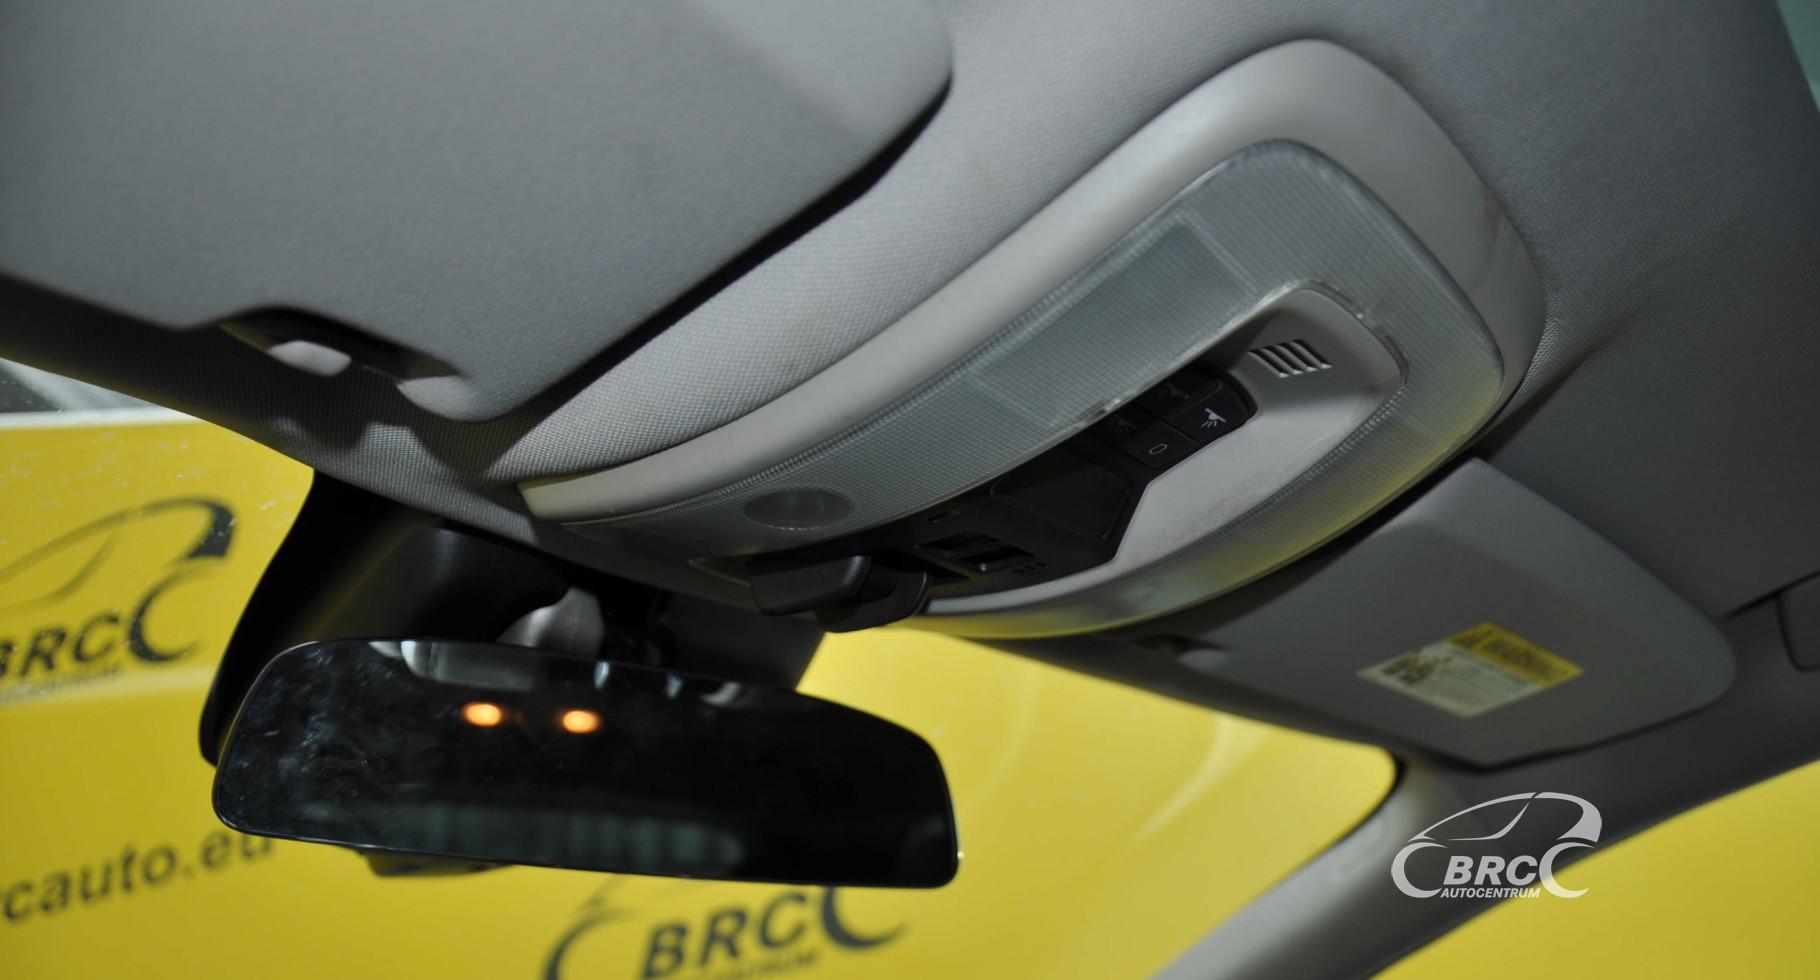 Volvo XC 60 2.5 T5 AWD Automatas